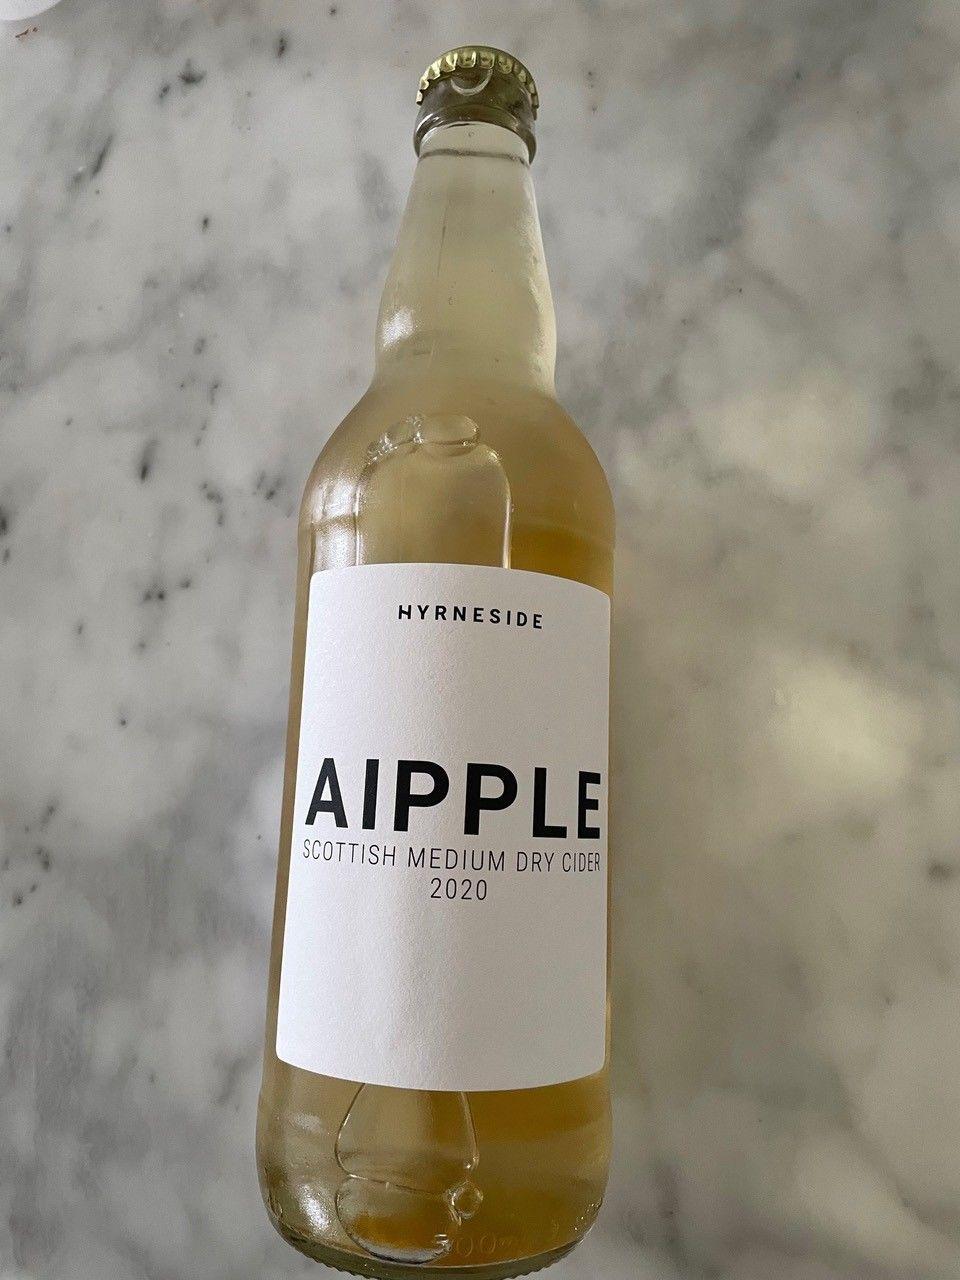 Hyrneside Aipple Cider